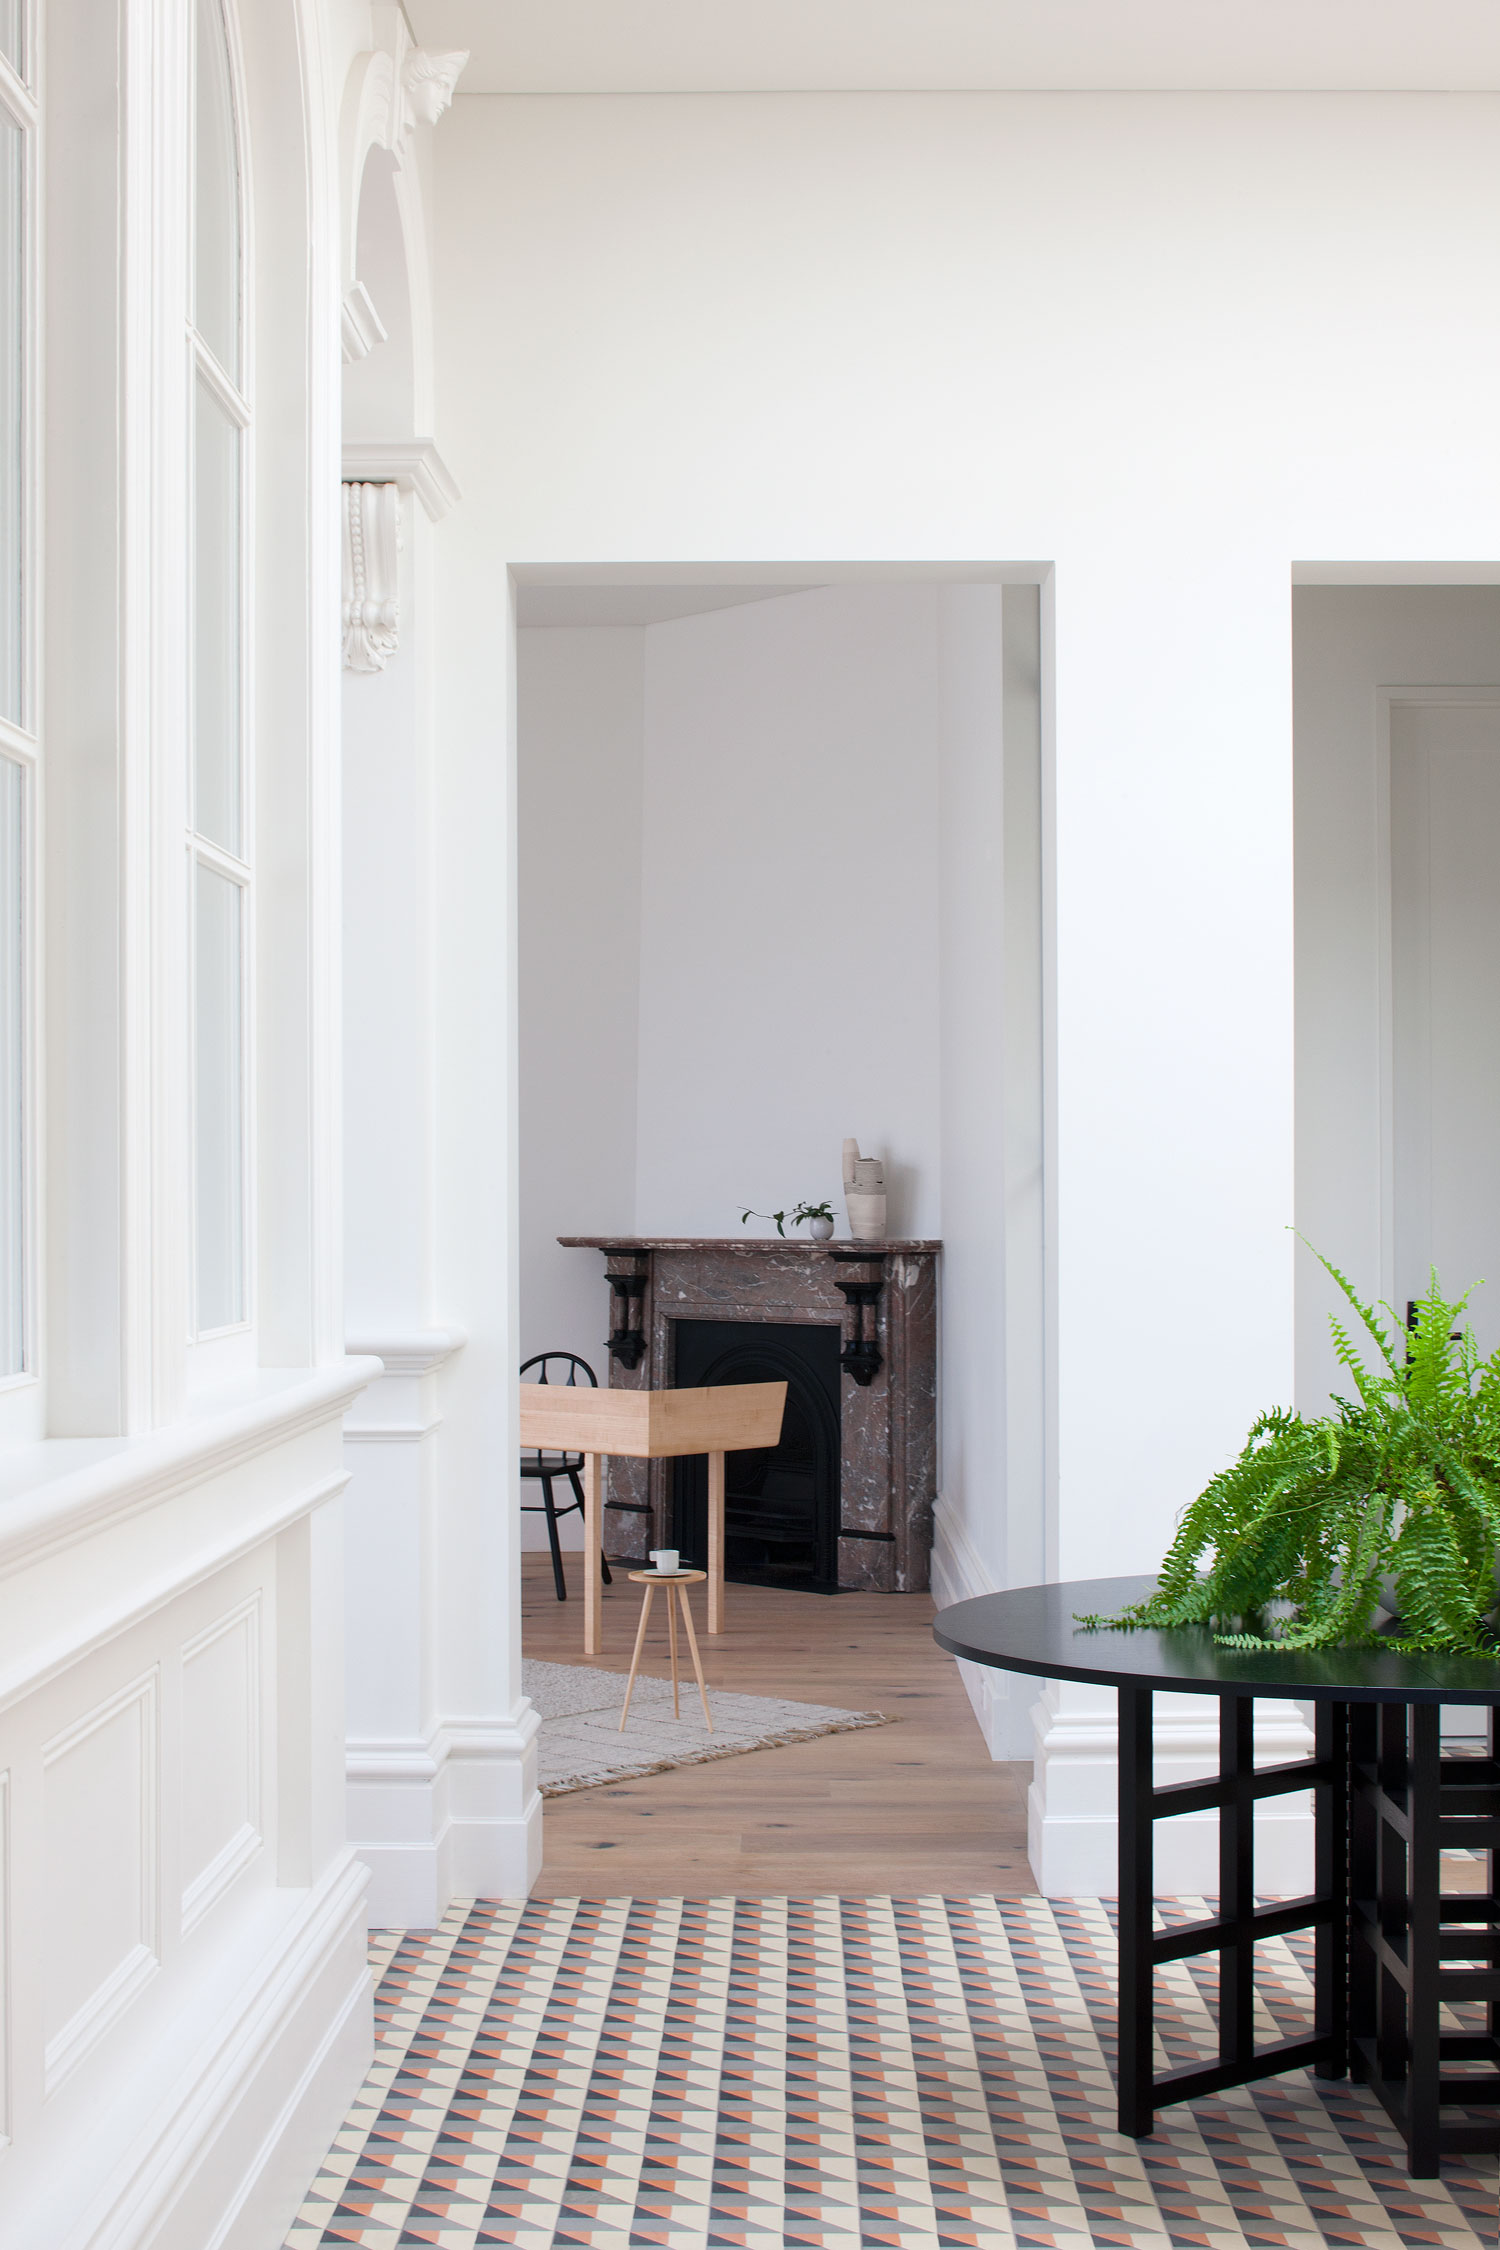 Hecker Guthrie Transform A Grand Victorian Residence